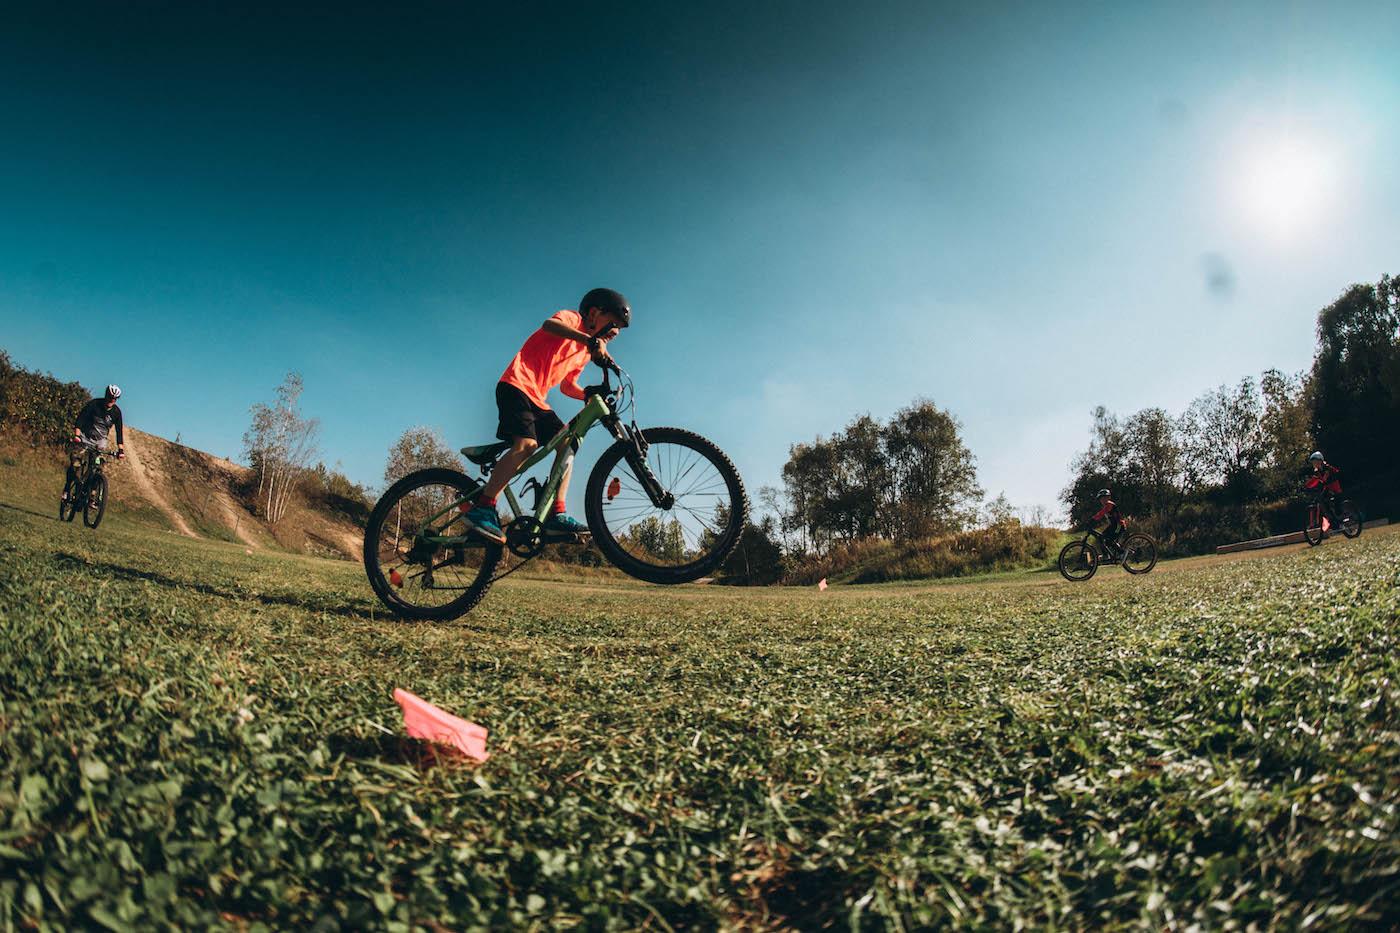 Mountainbike Kinder Kurs in München - 8-12 Jahre Kids - Rock my Trail Fahrtechnik Bikeschule -